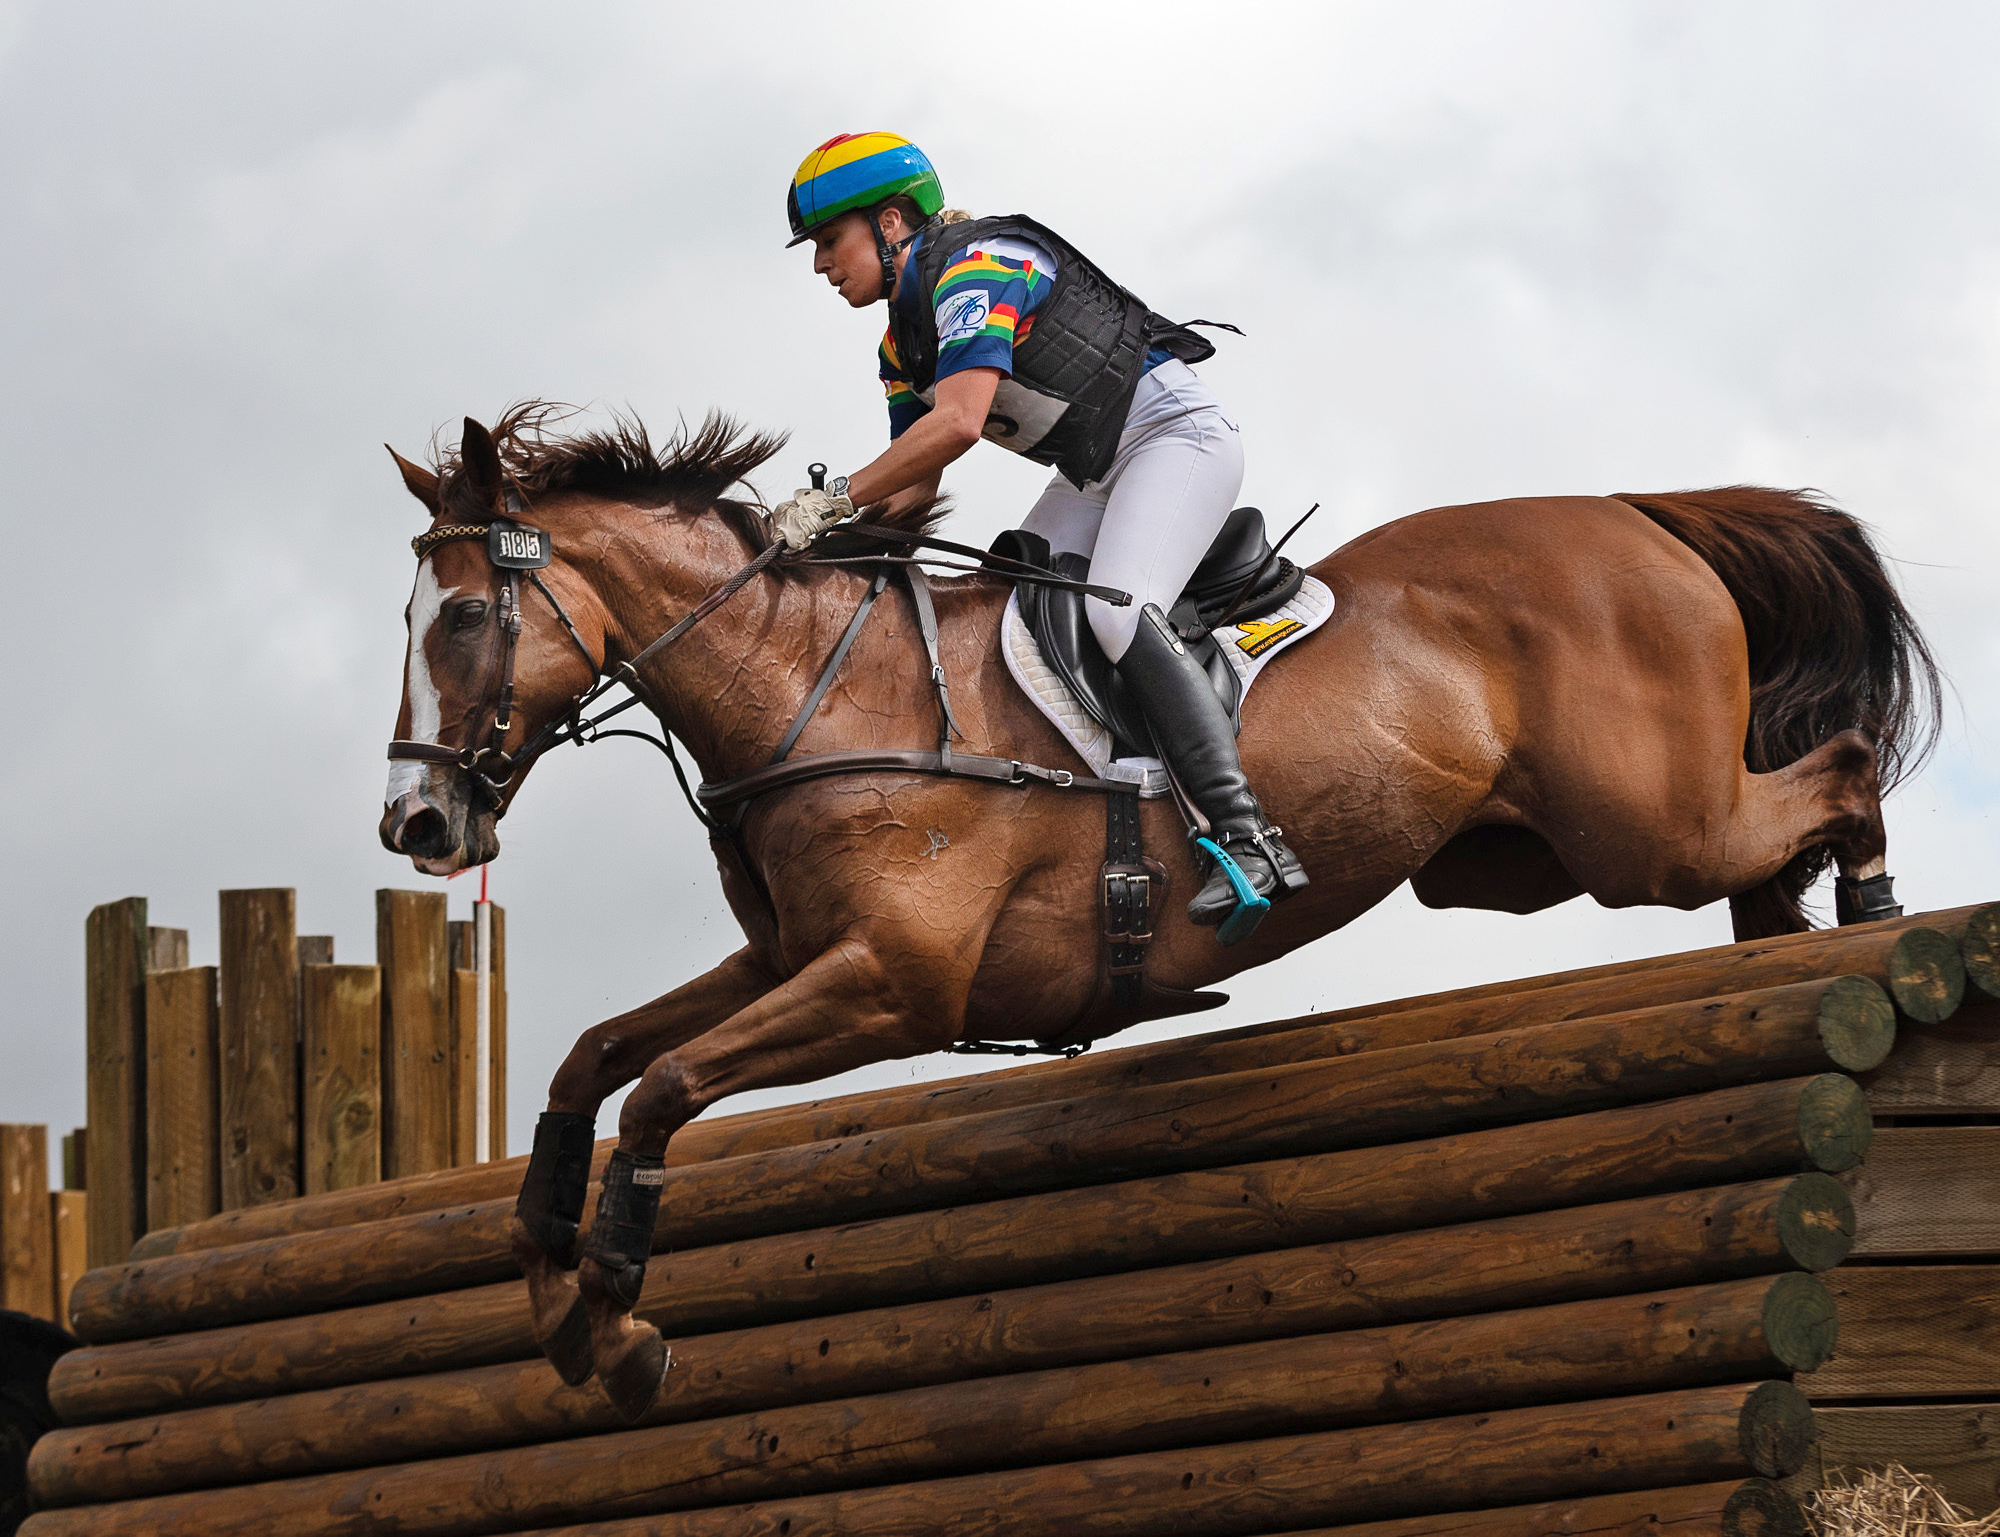 Megan Jones, Event Rider - photo by Franz Venhaus via Flickr (CC BY-ND 2.0) - Globetrotting horse riding holidays